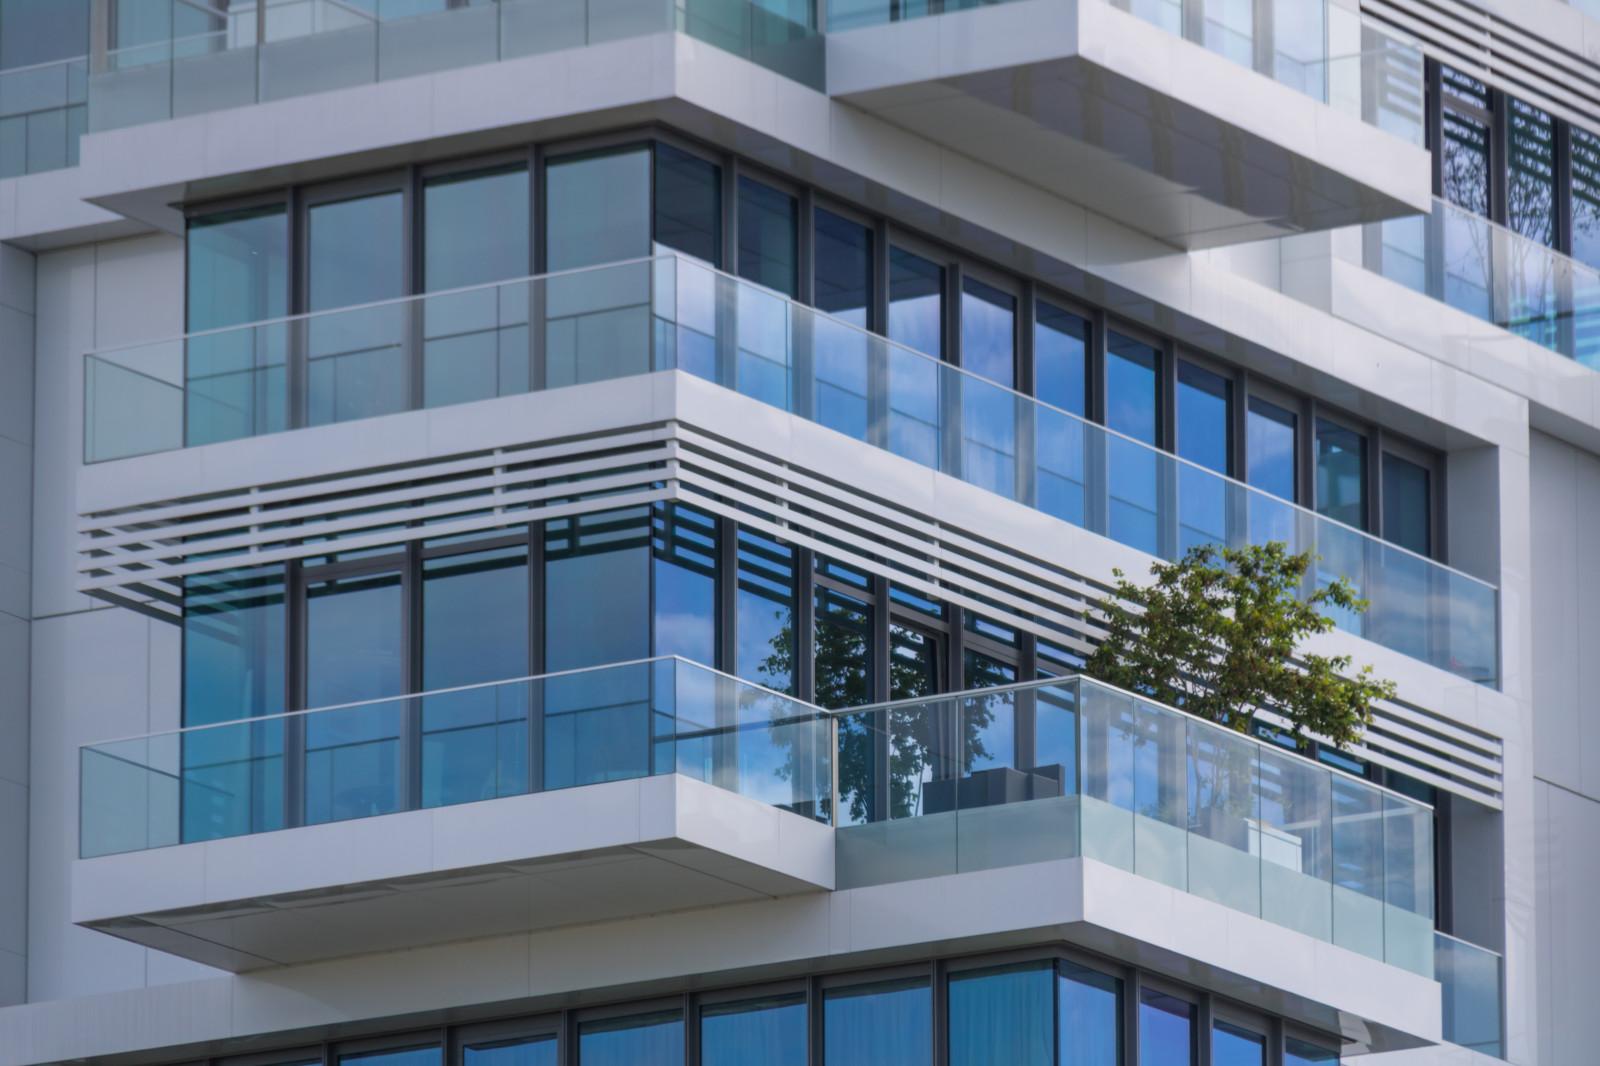 Обои : окно, архитектура, здание, германия, балкон, дизайн и.